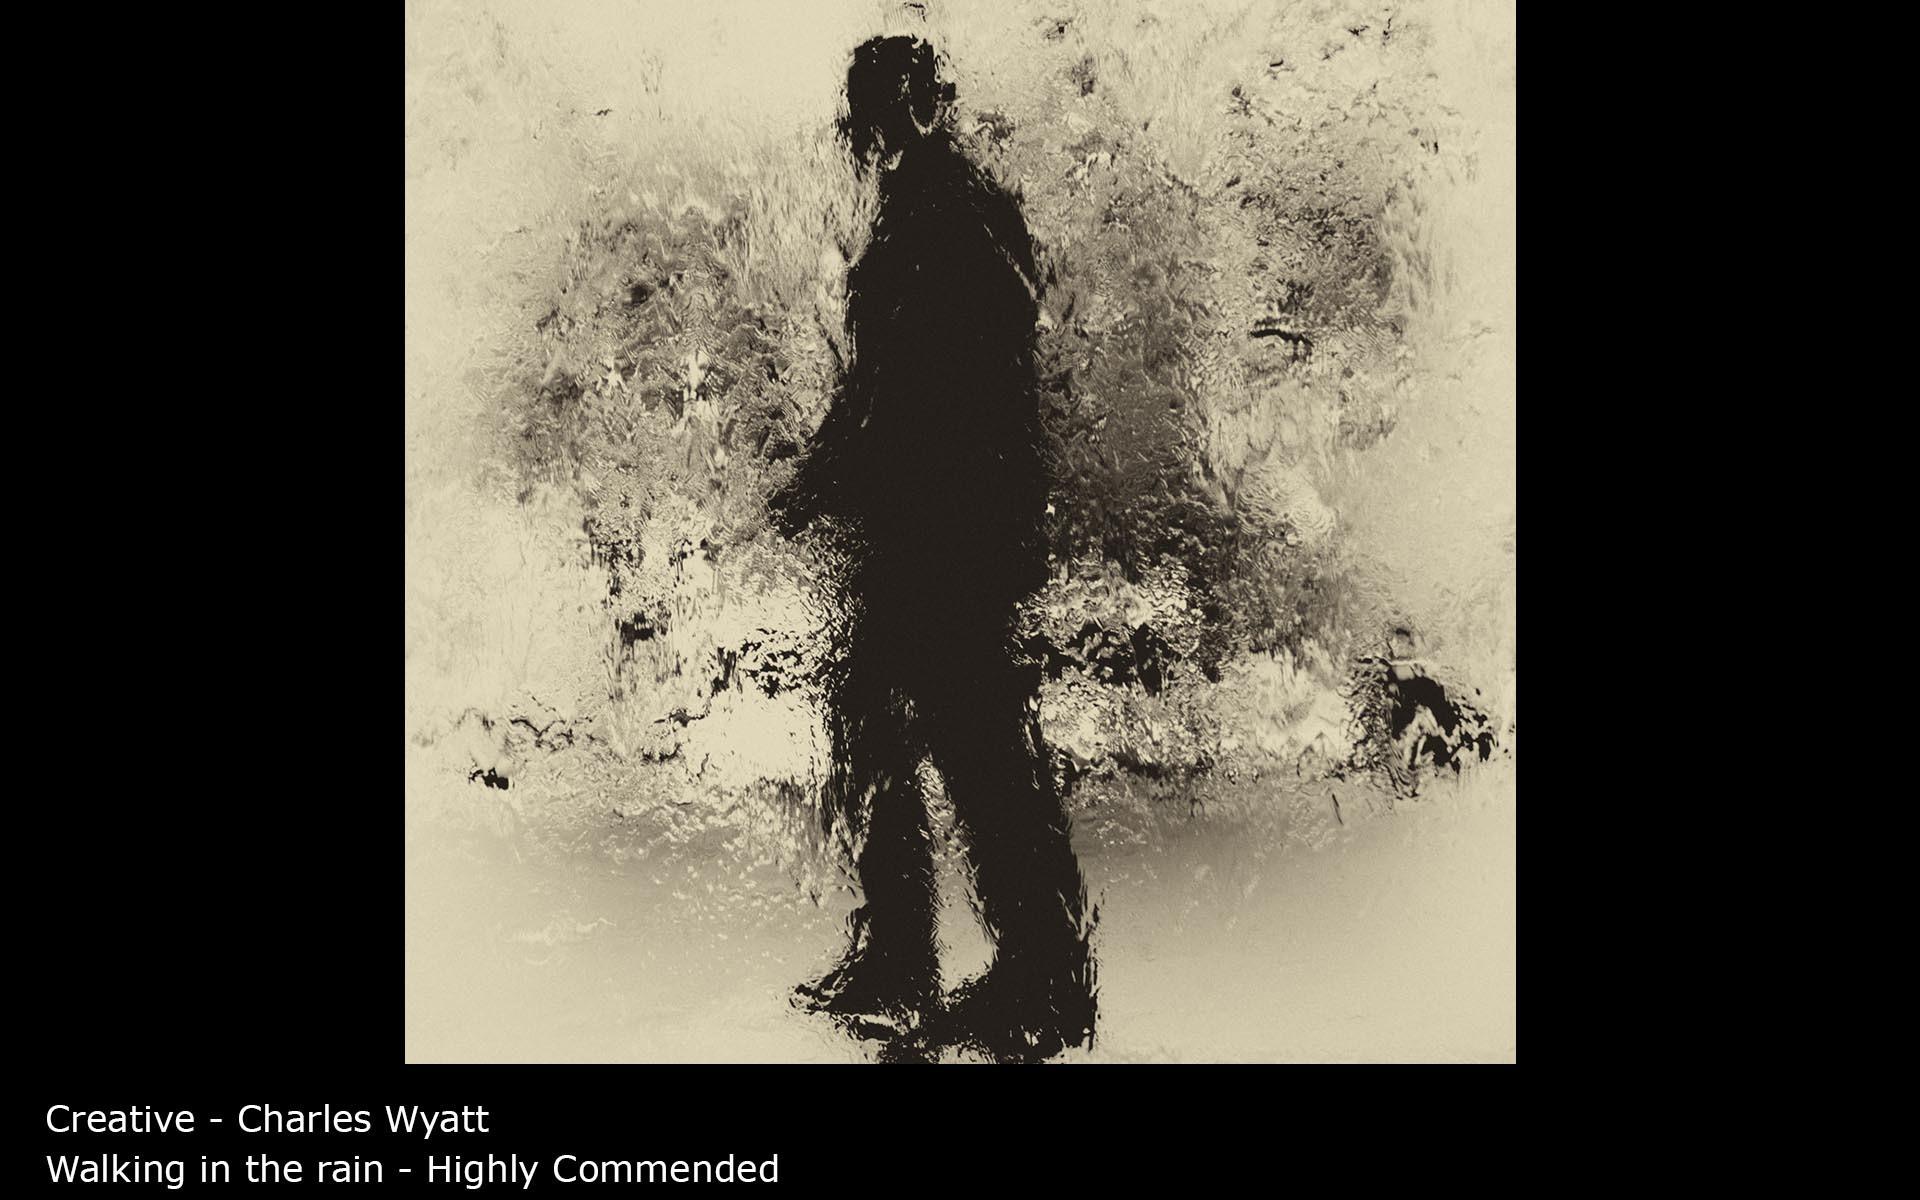 Walking in the rain - Charles Wyatt